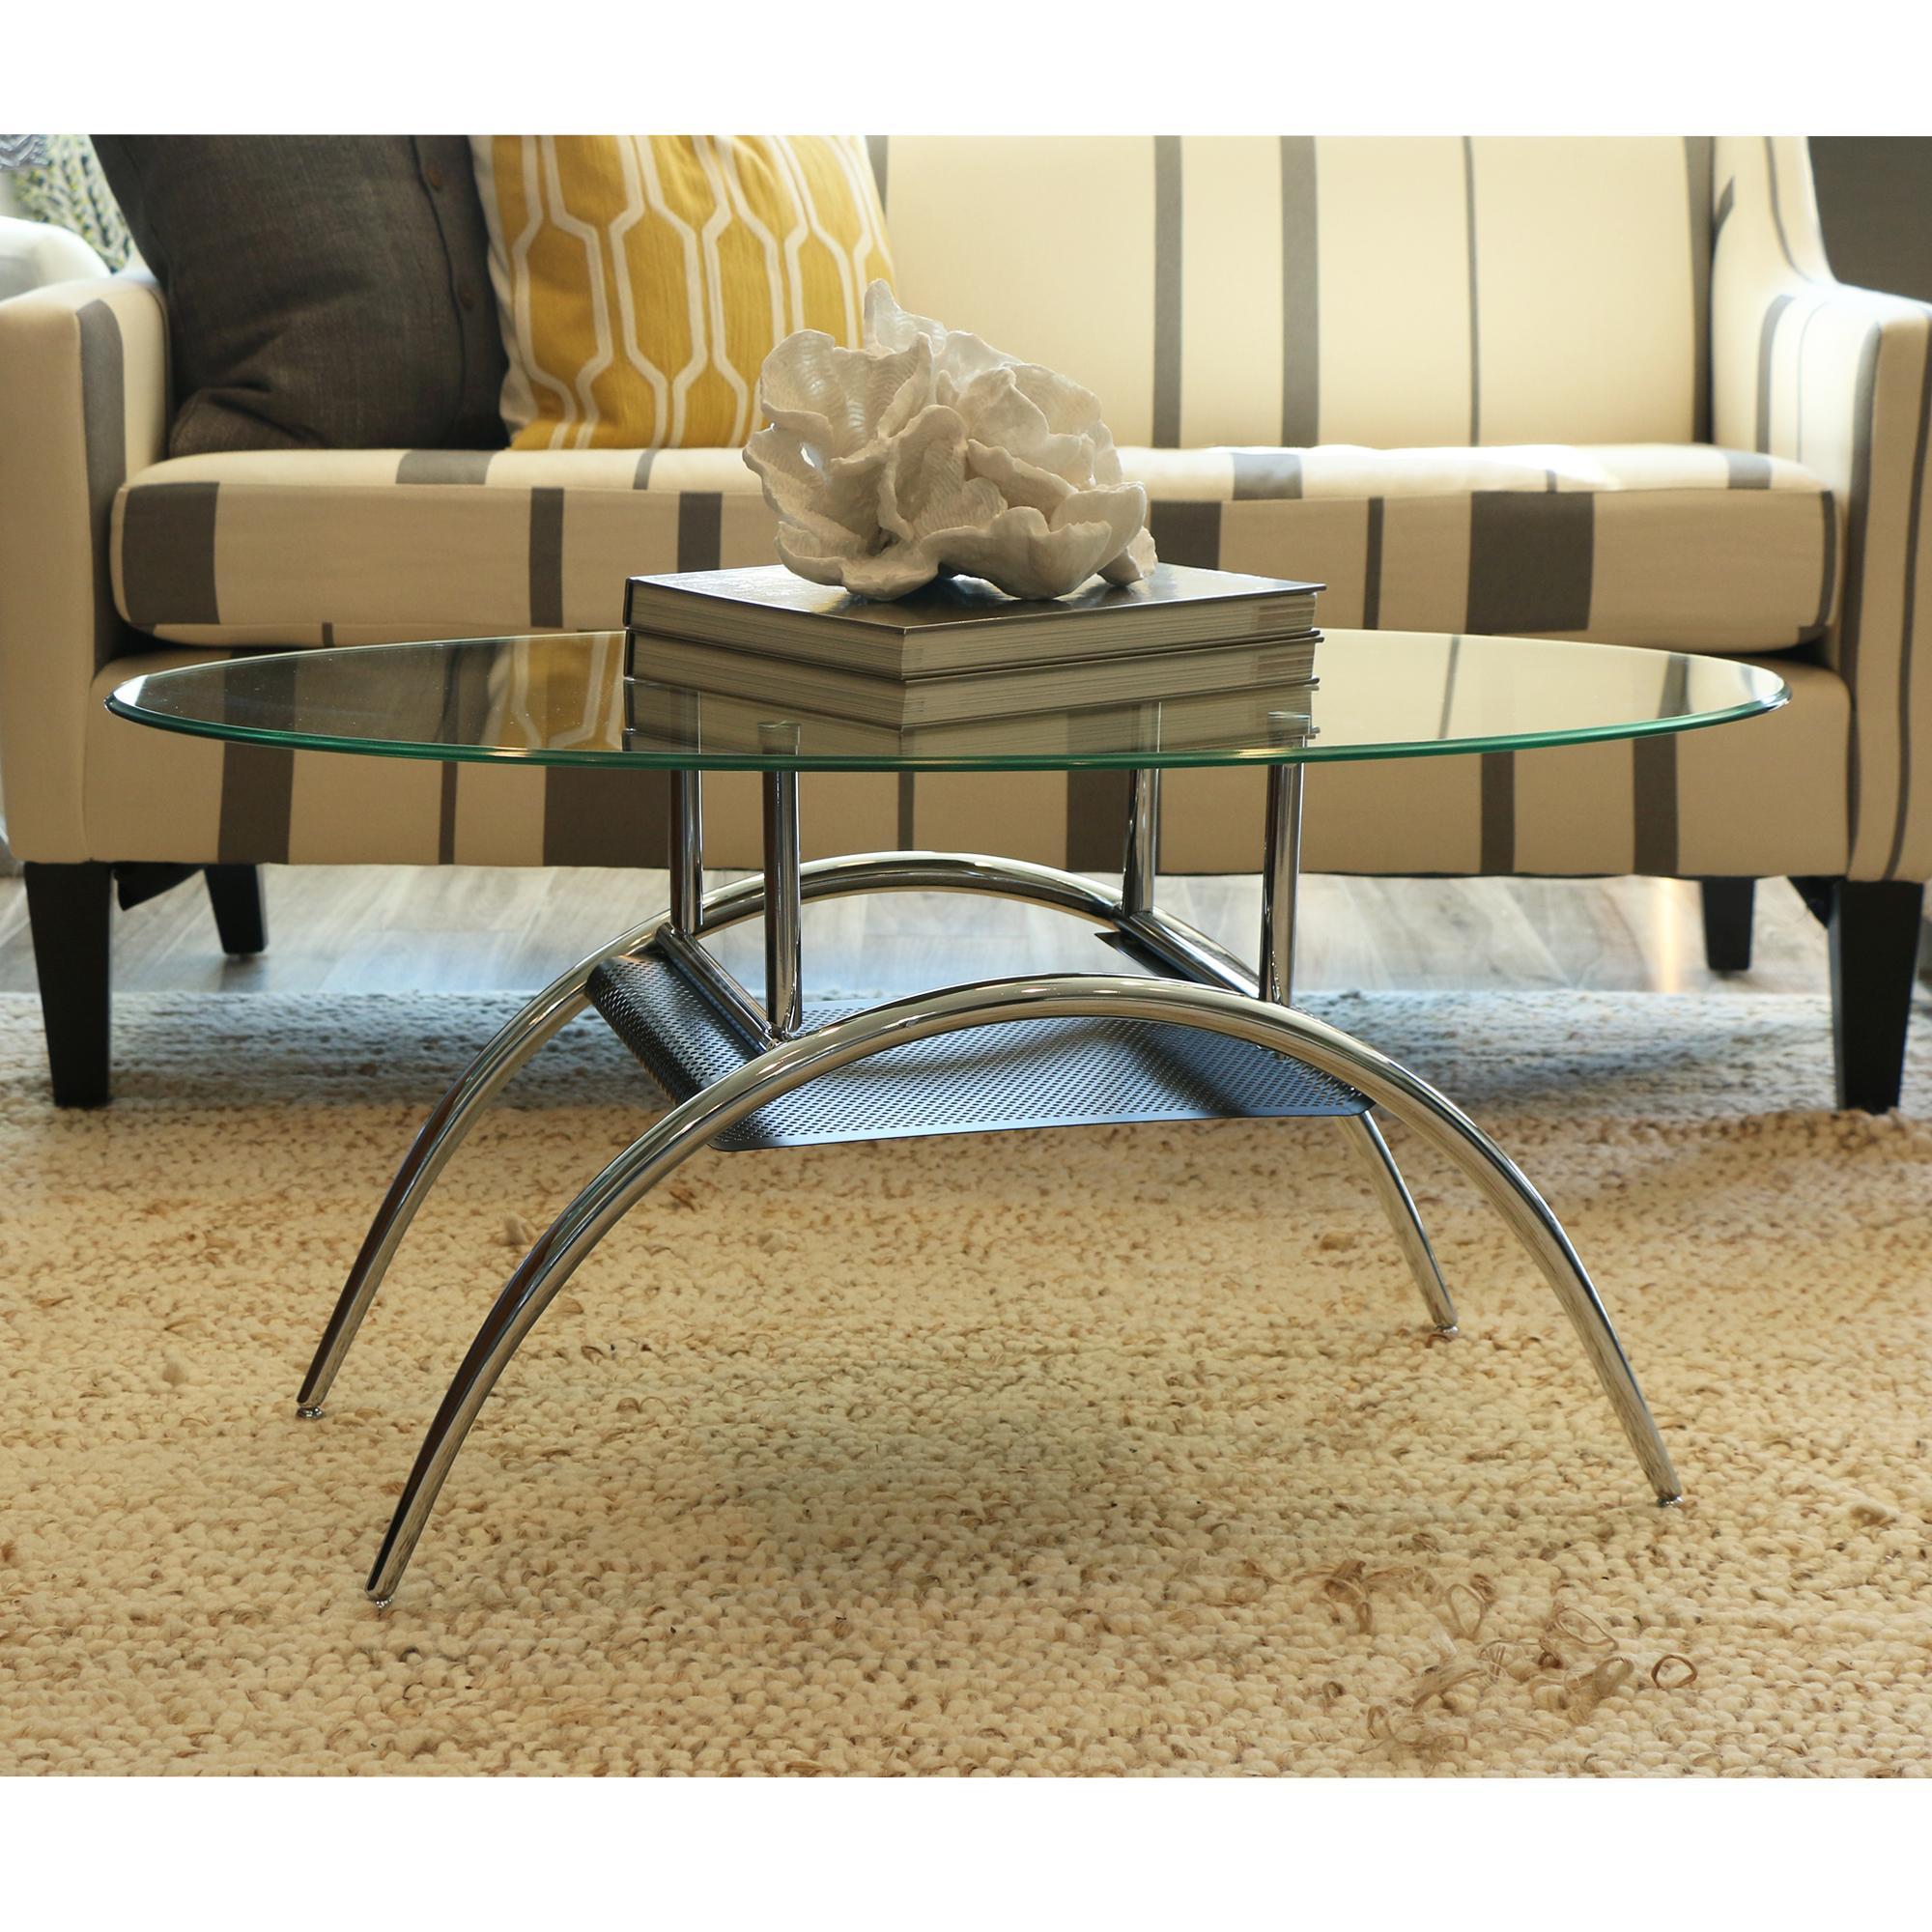 Black Glass Coffee Table Amazon: Glass Oval Coffee Table